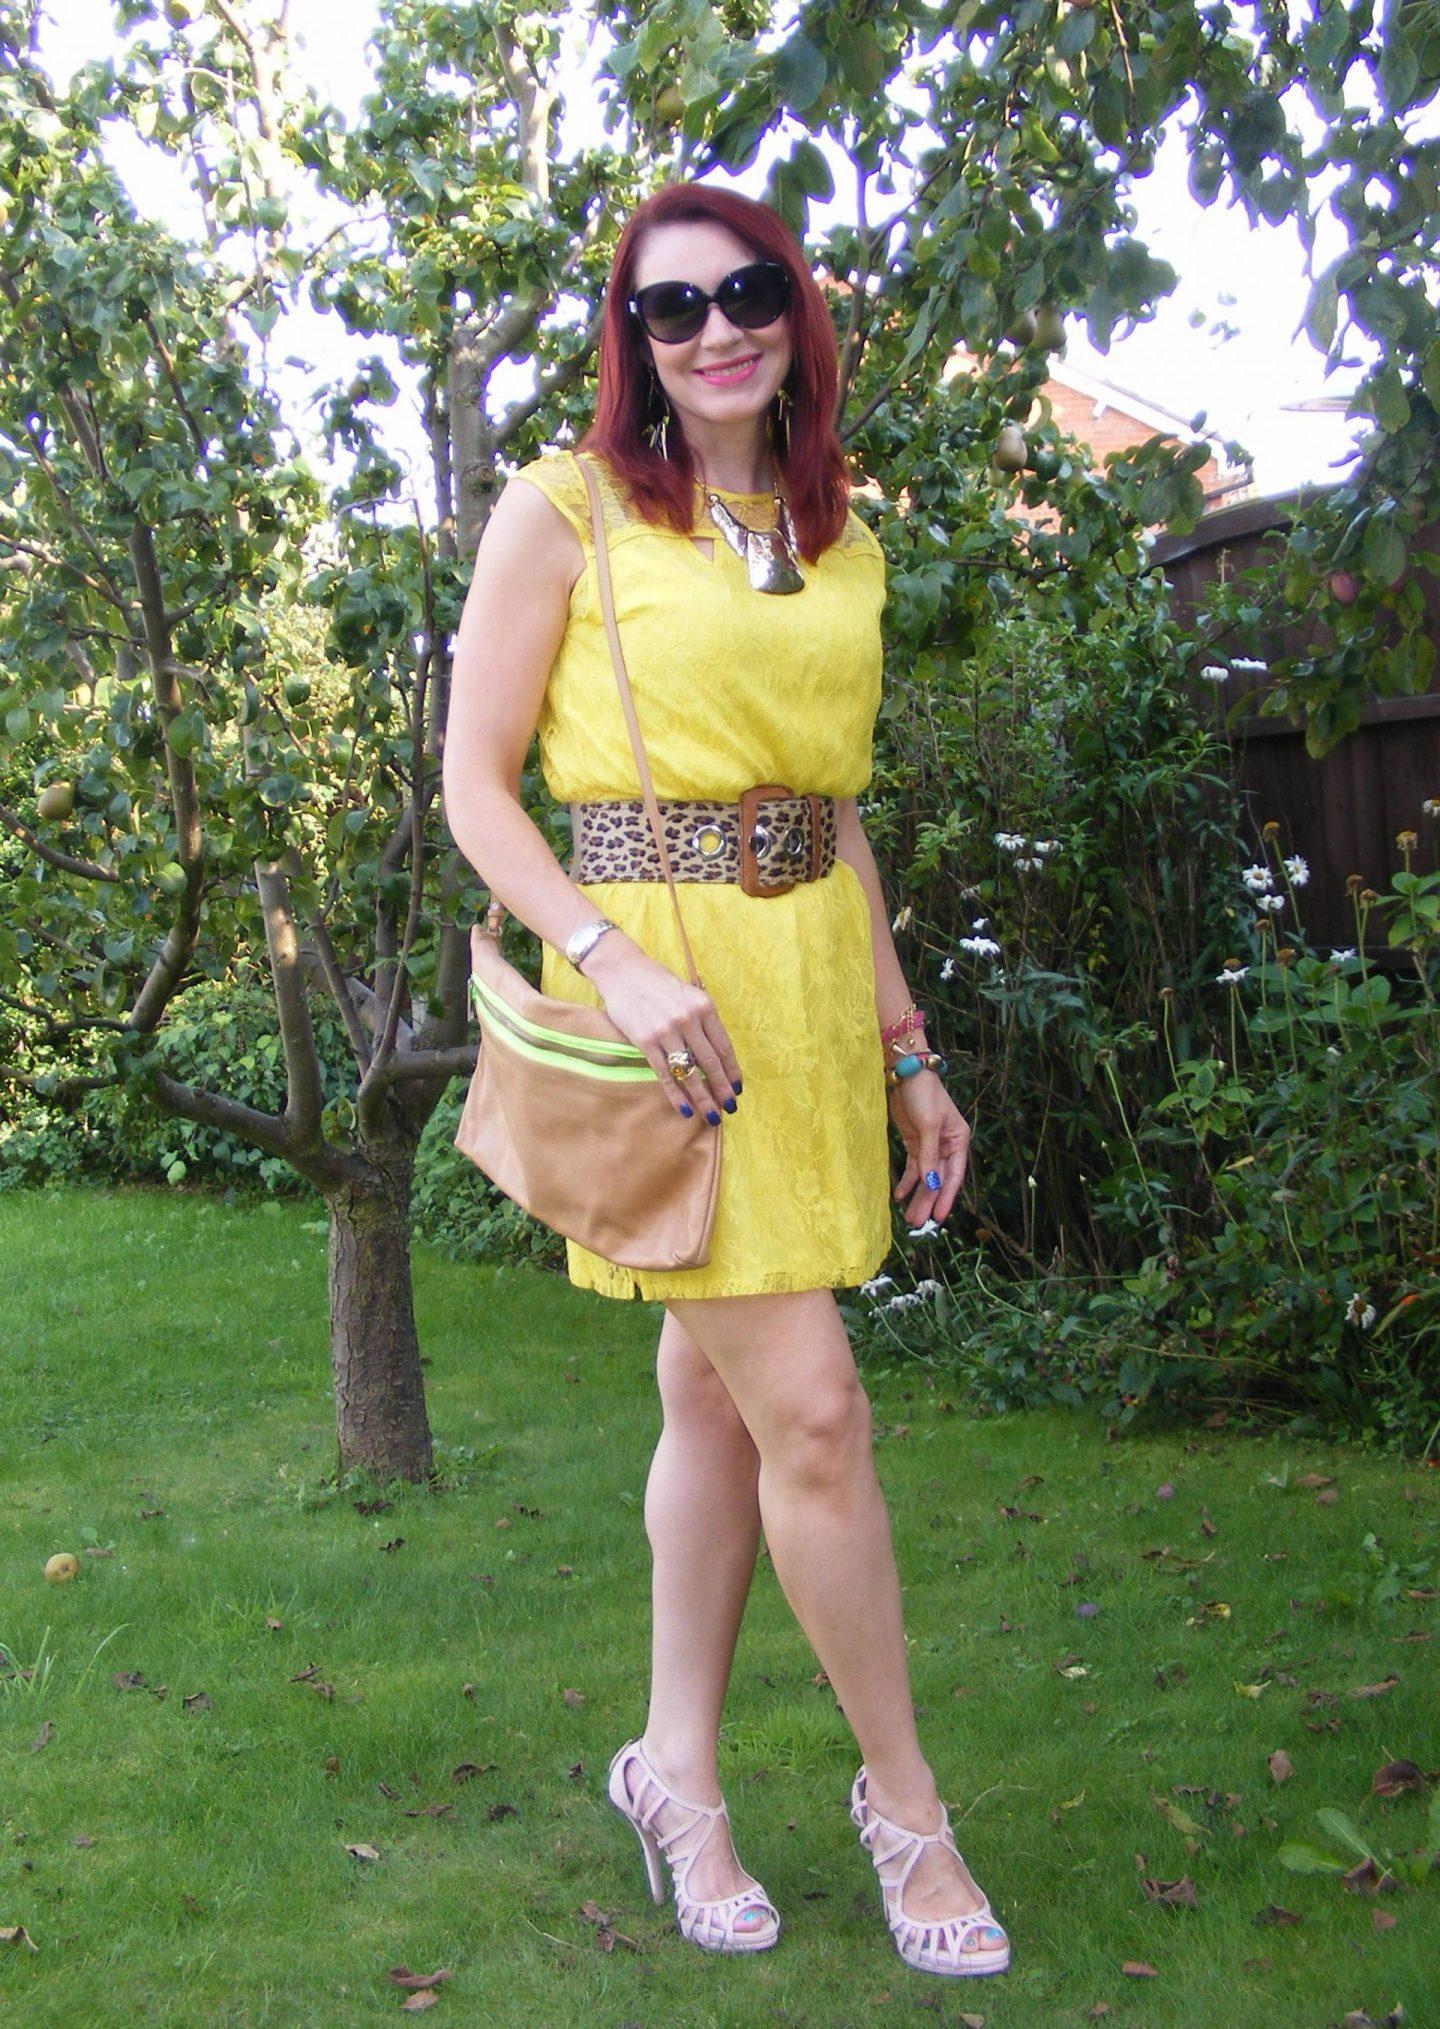 Bargain Yellow Lace Dress and Leopard Print Belt, Zara tan clutch bag